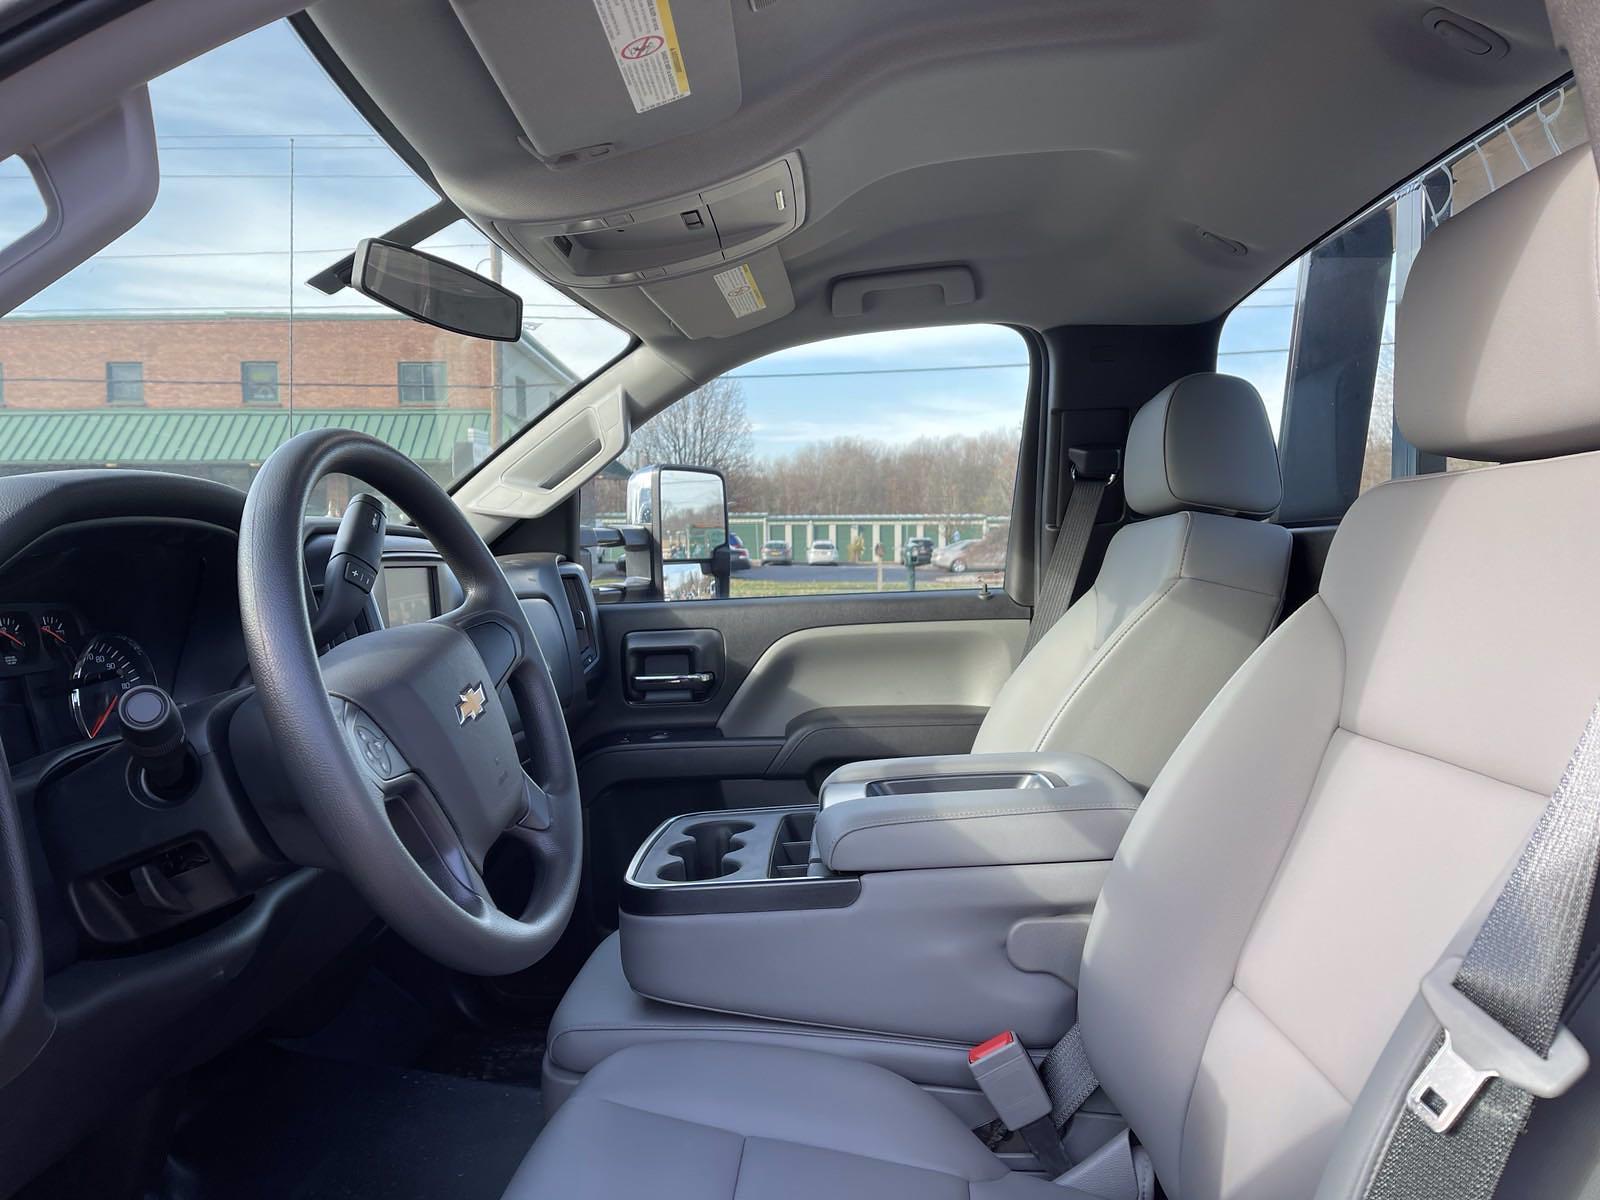 2020 Chevrolet Silverado 6500 Regular Cab DRW 4x2, Danco Rollback Body #201081D - photo 12